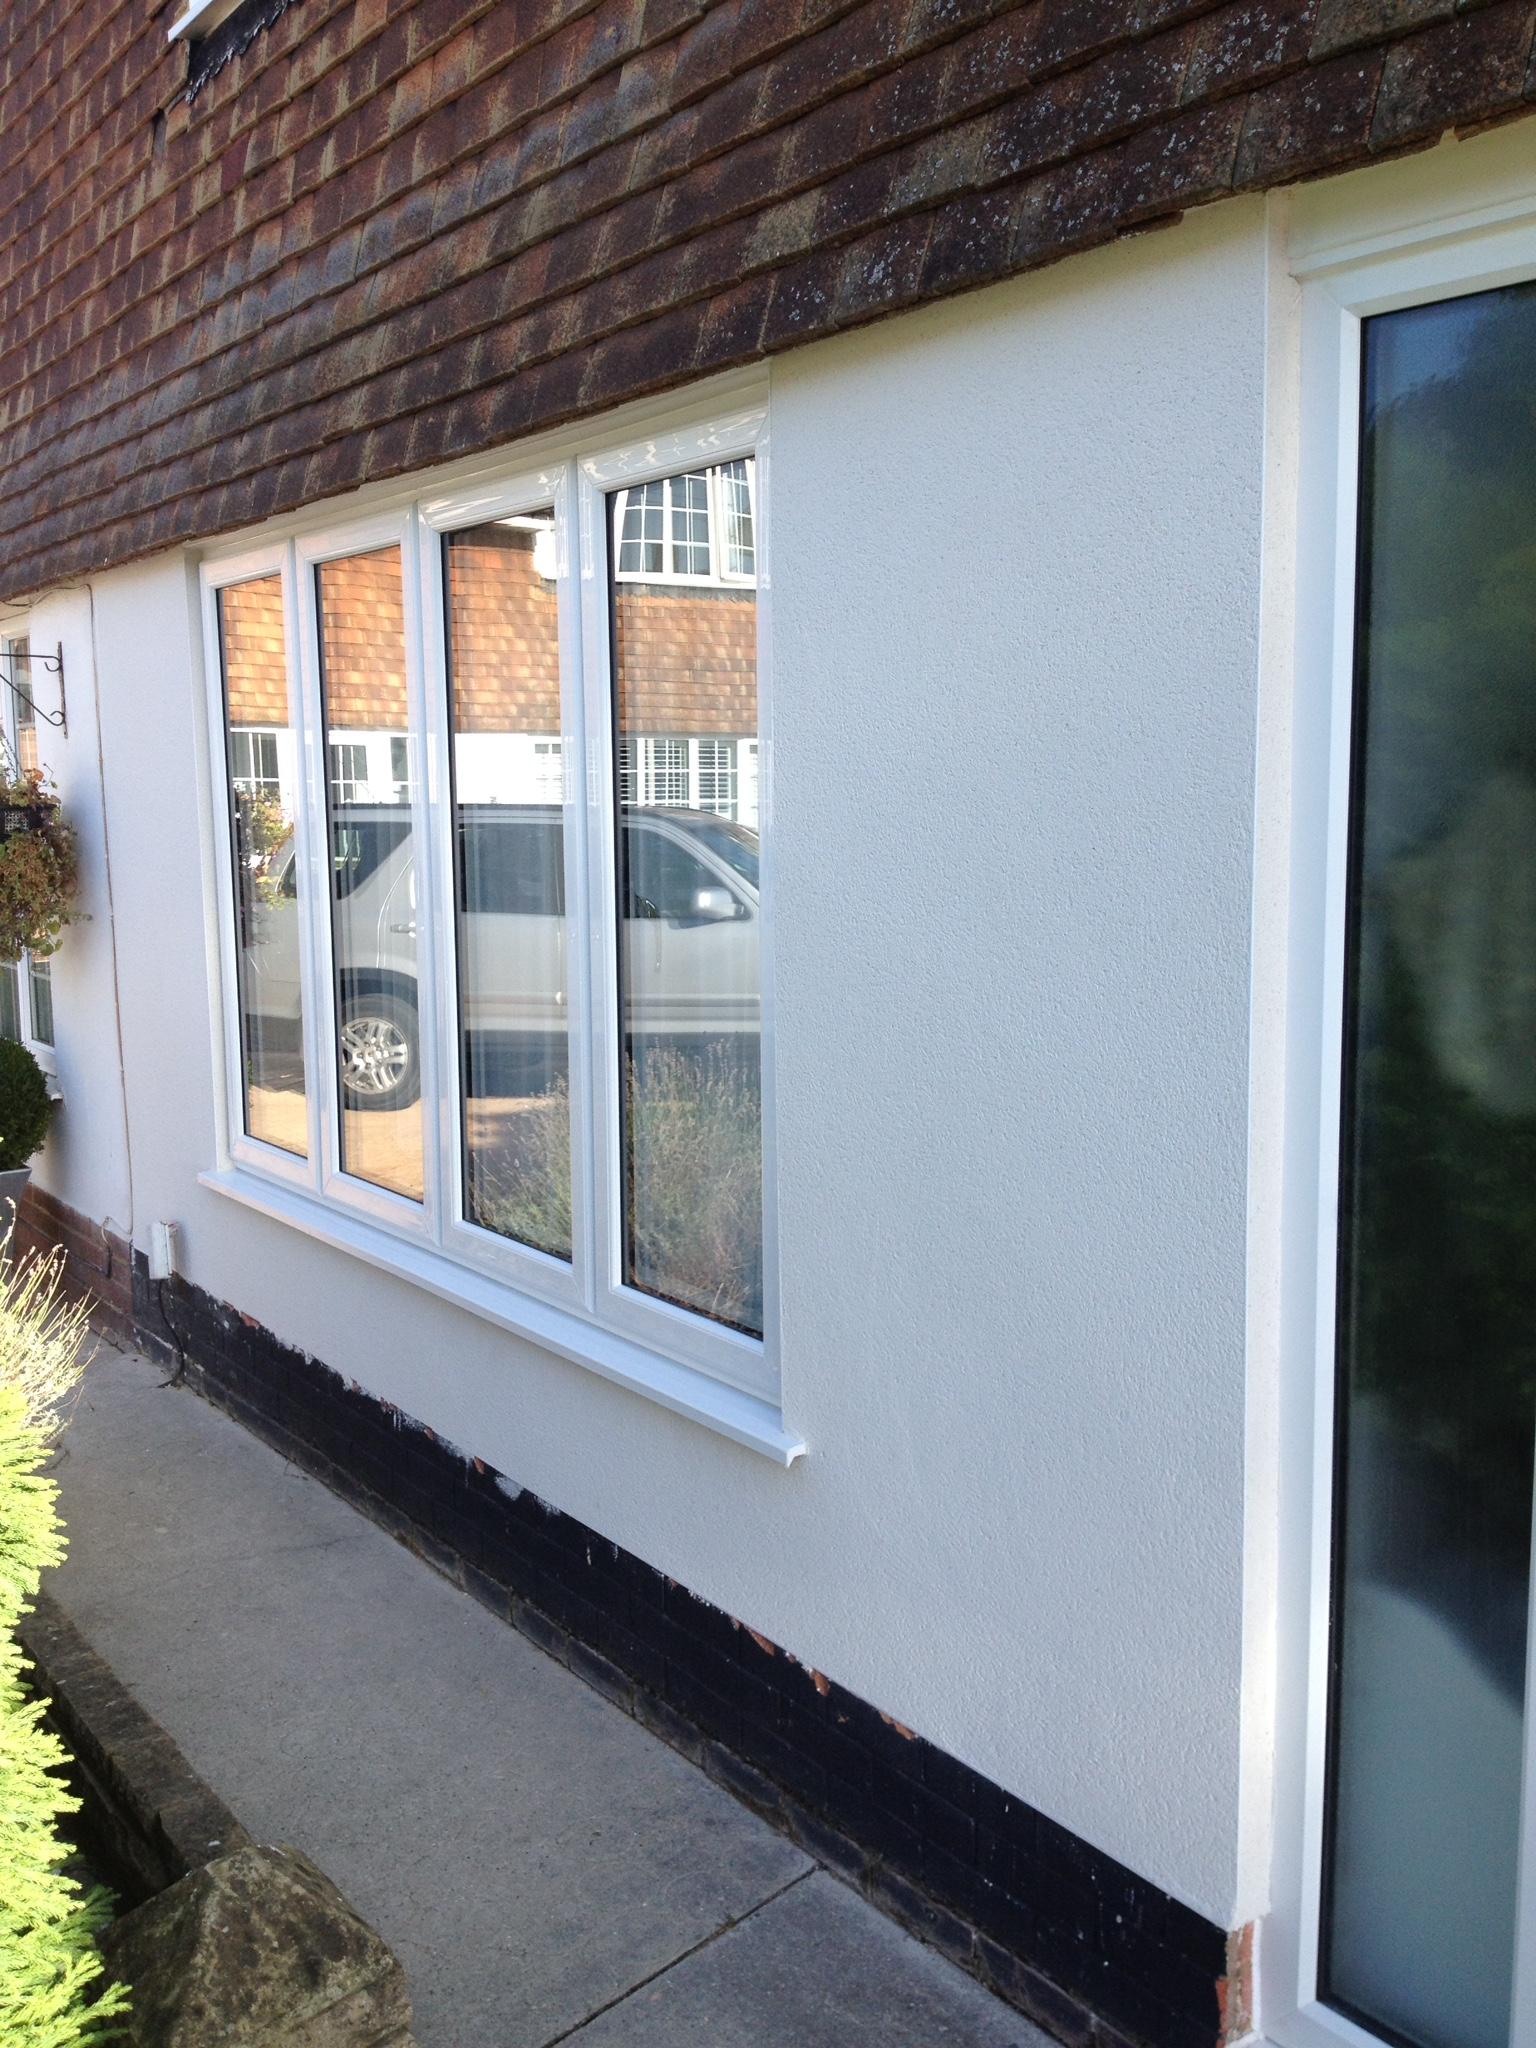 Casement Windows & Doors, Orangeries, Roofs, Extentions, Sovereign Home, Essex (2482)